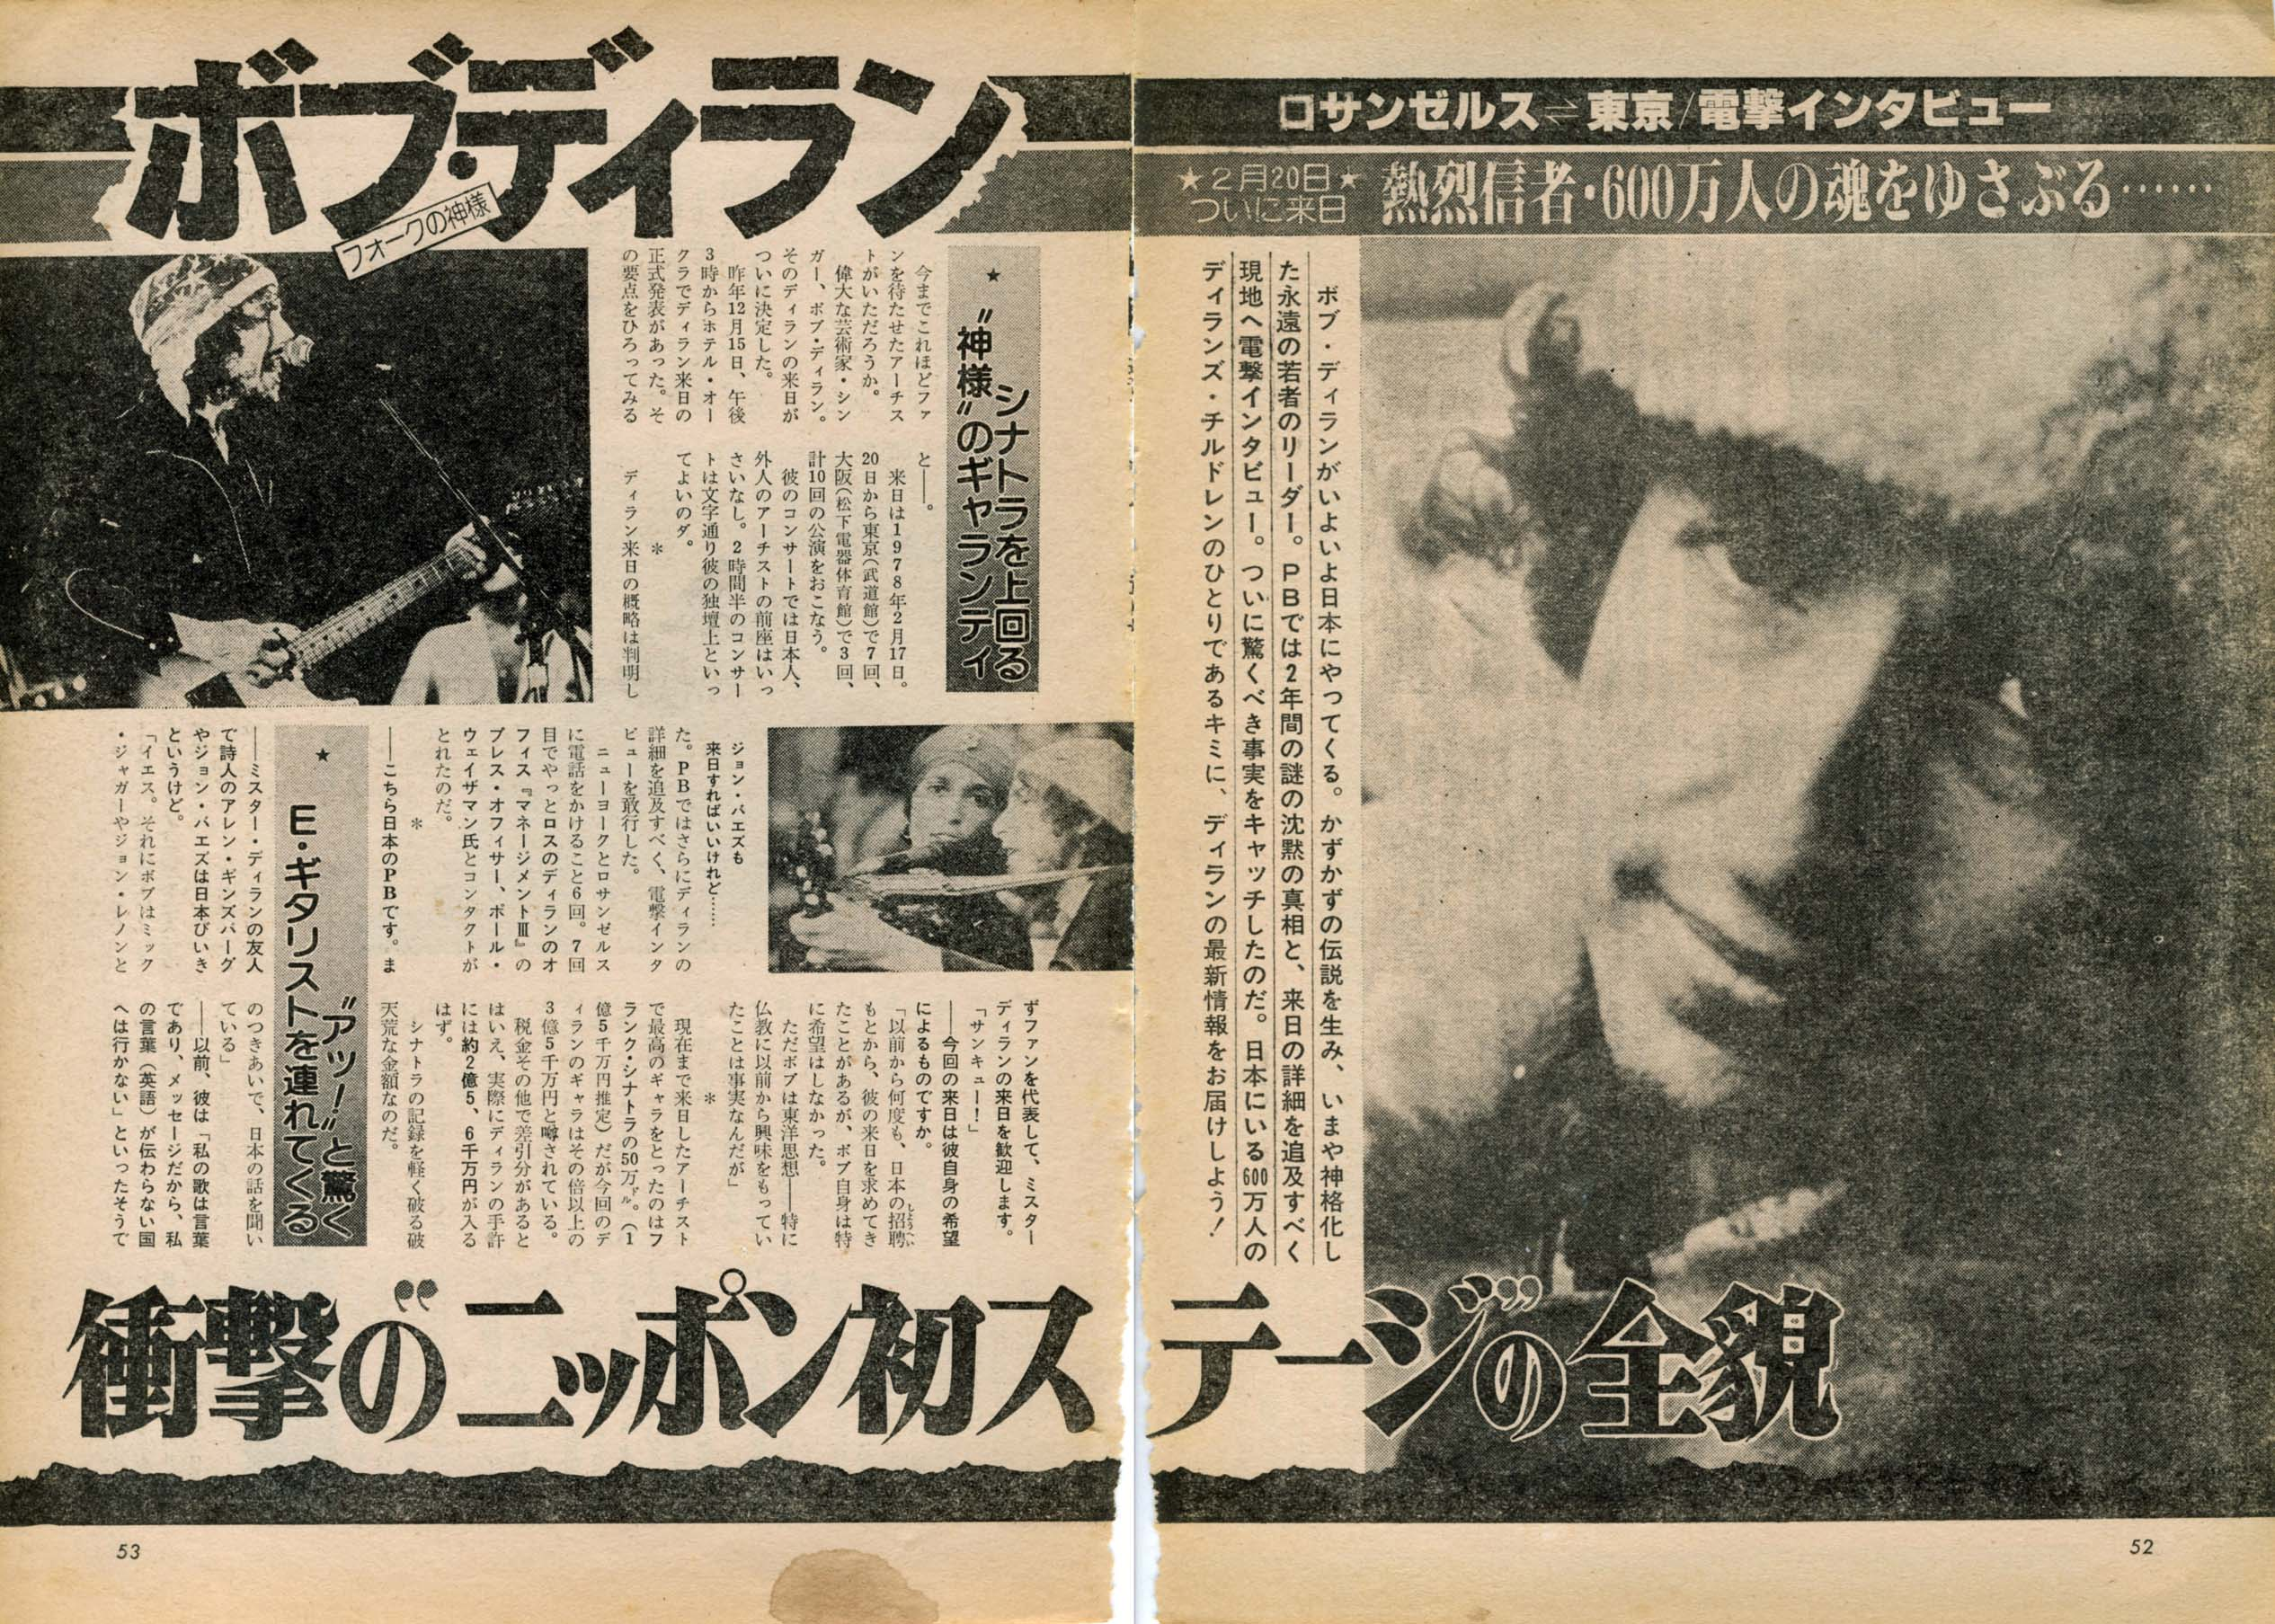 1978 WEEKLY PLAYBOY